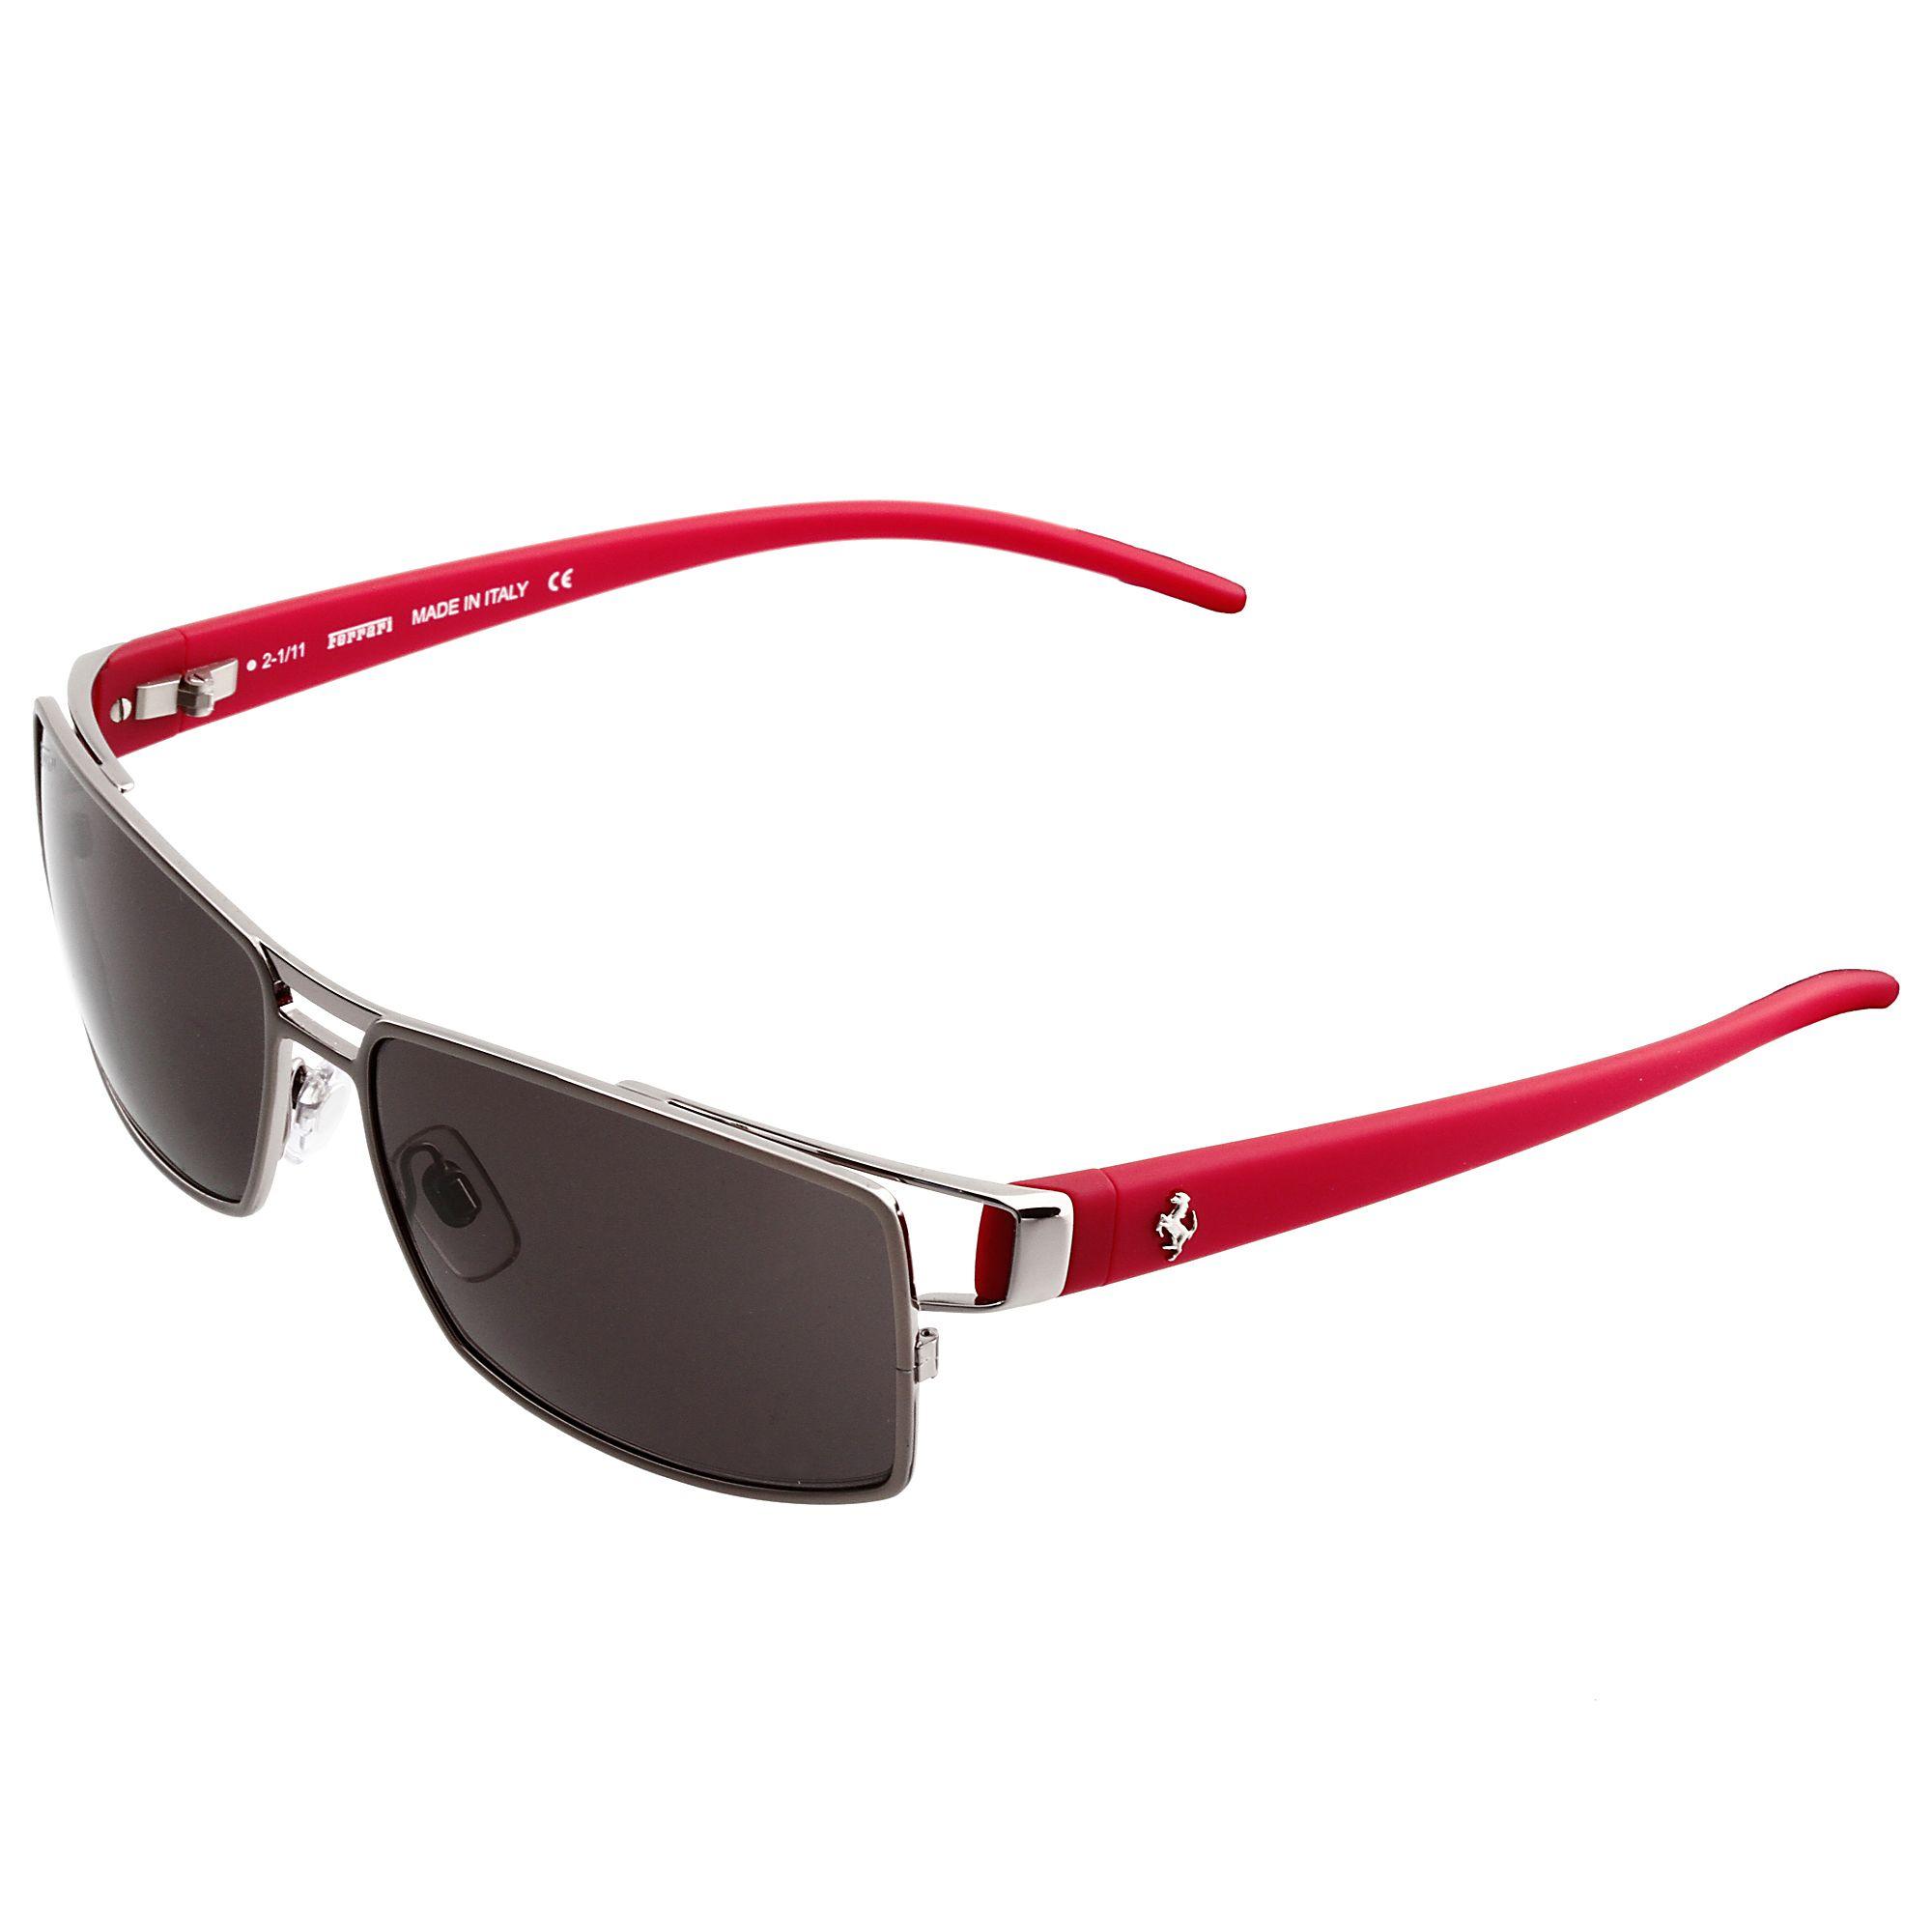 FERRARI STORE | Ferrari Gran Turismo sunglasses FR85 #ferraristore #sunglasses #ferrari